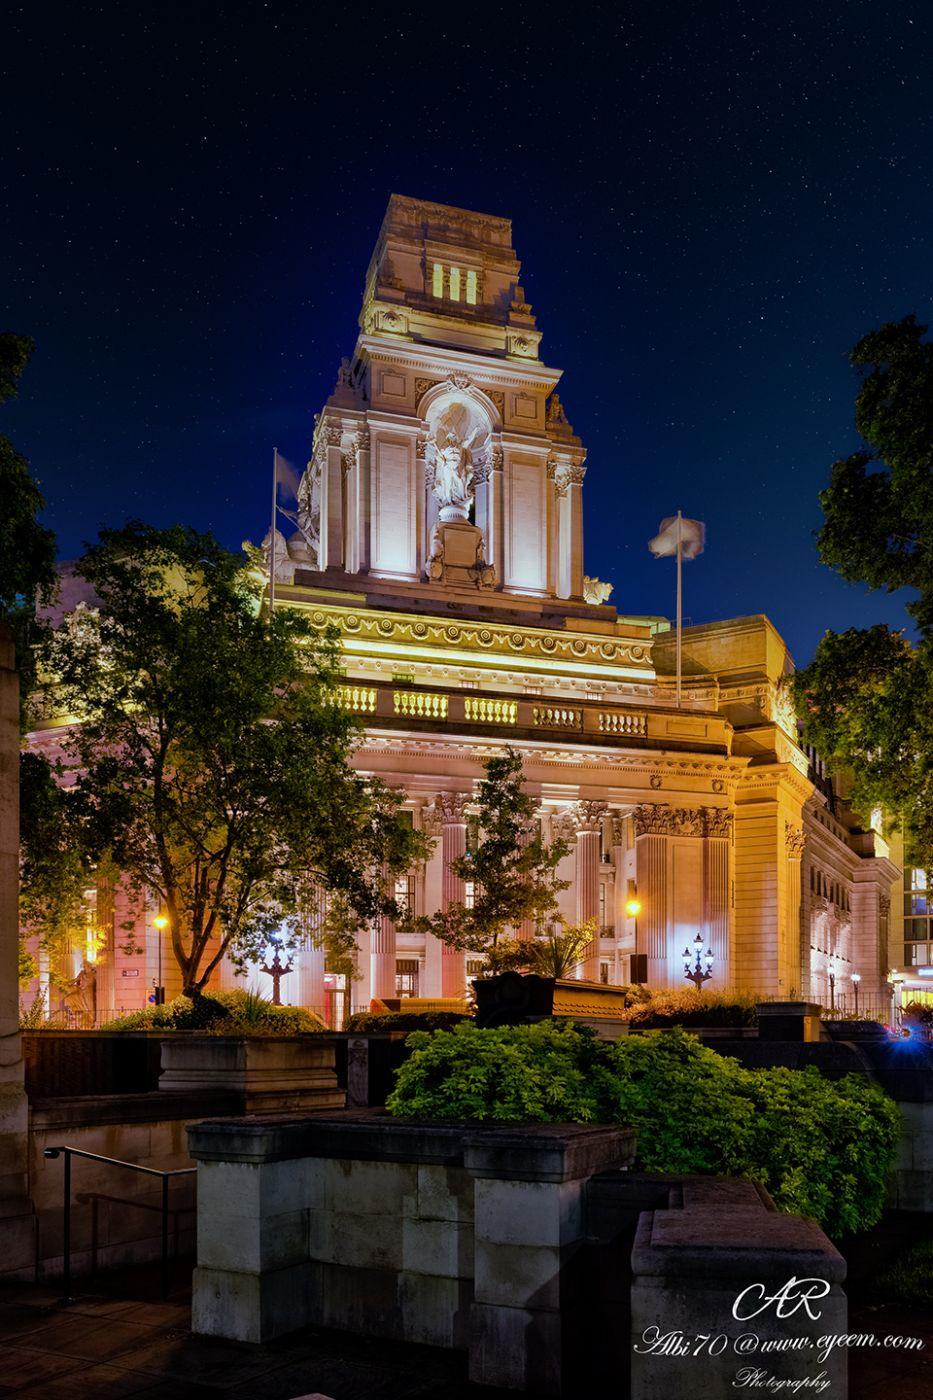 View from Trinity Square Gardens, United Kingdom